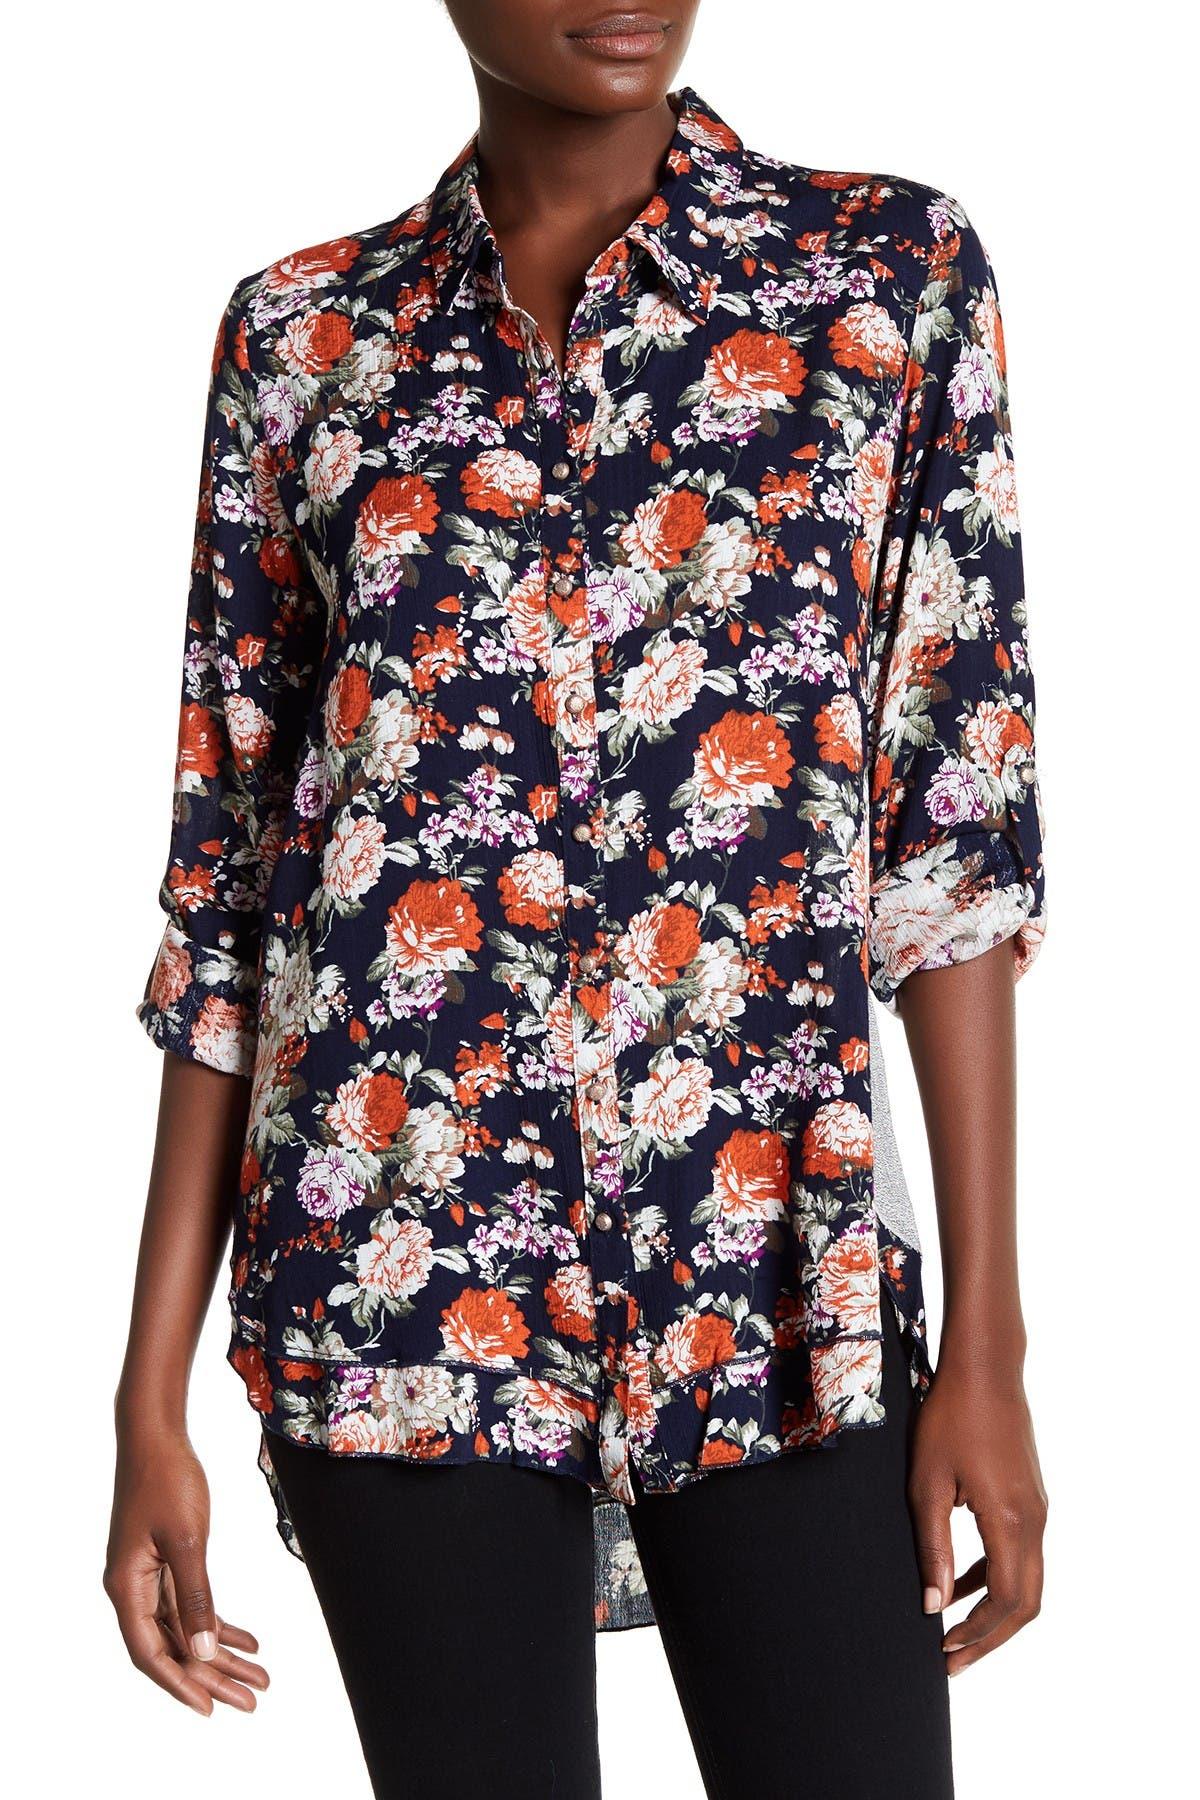 Image of ARATTA Flower Power Shirt